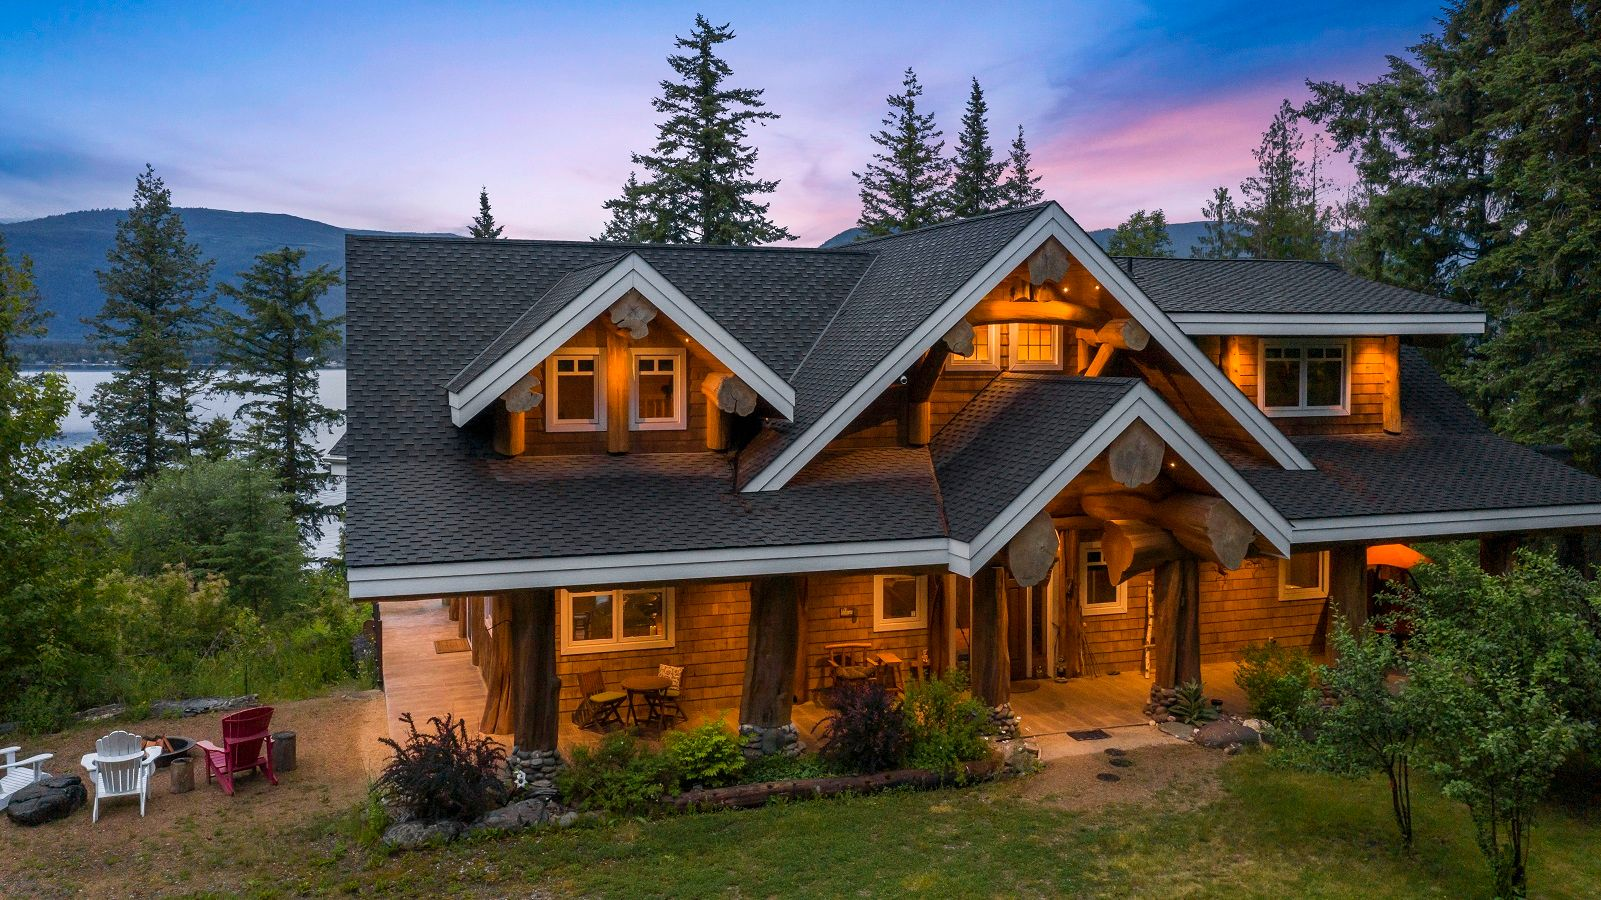 Main Photo: 1897 Blind Bay Road: Blind Bay House for sale (Shuswap Lake)  : MLS®# 10233379